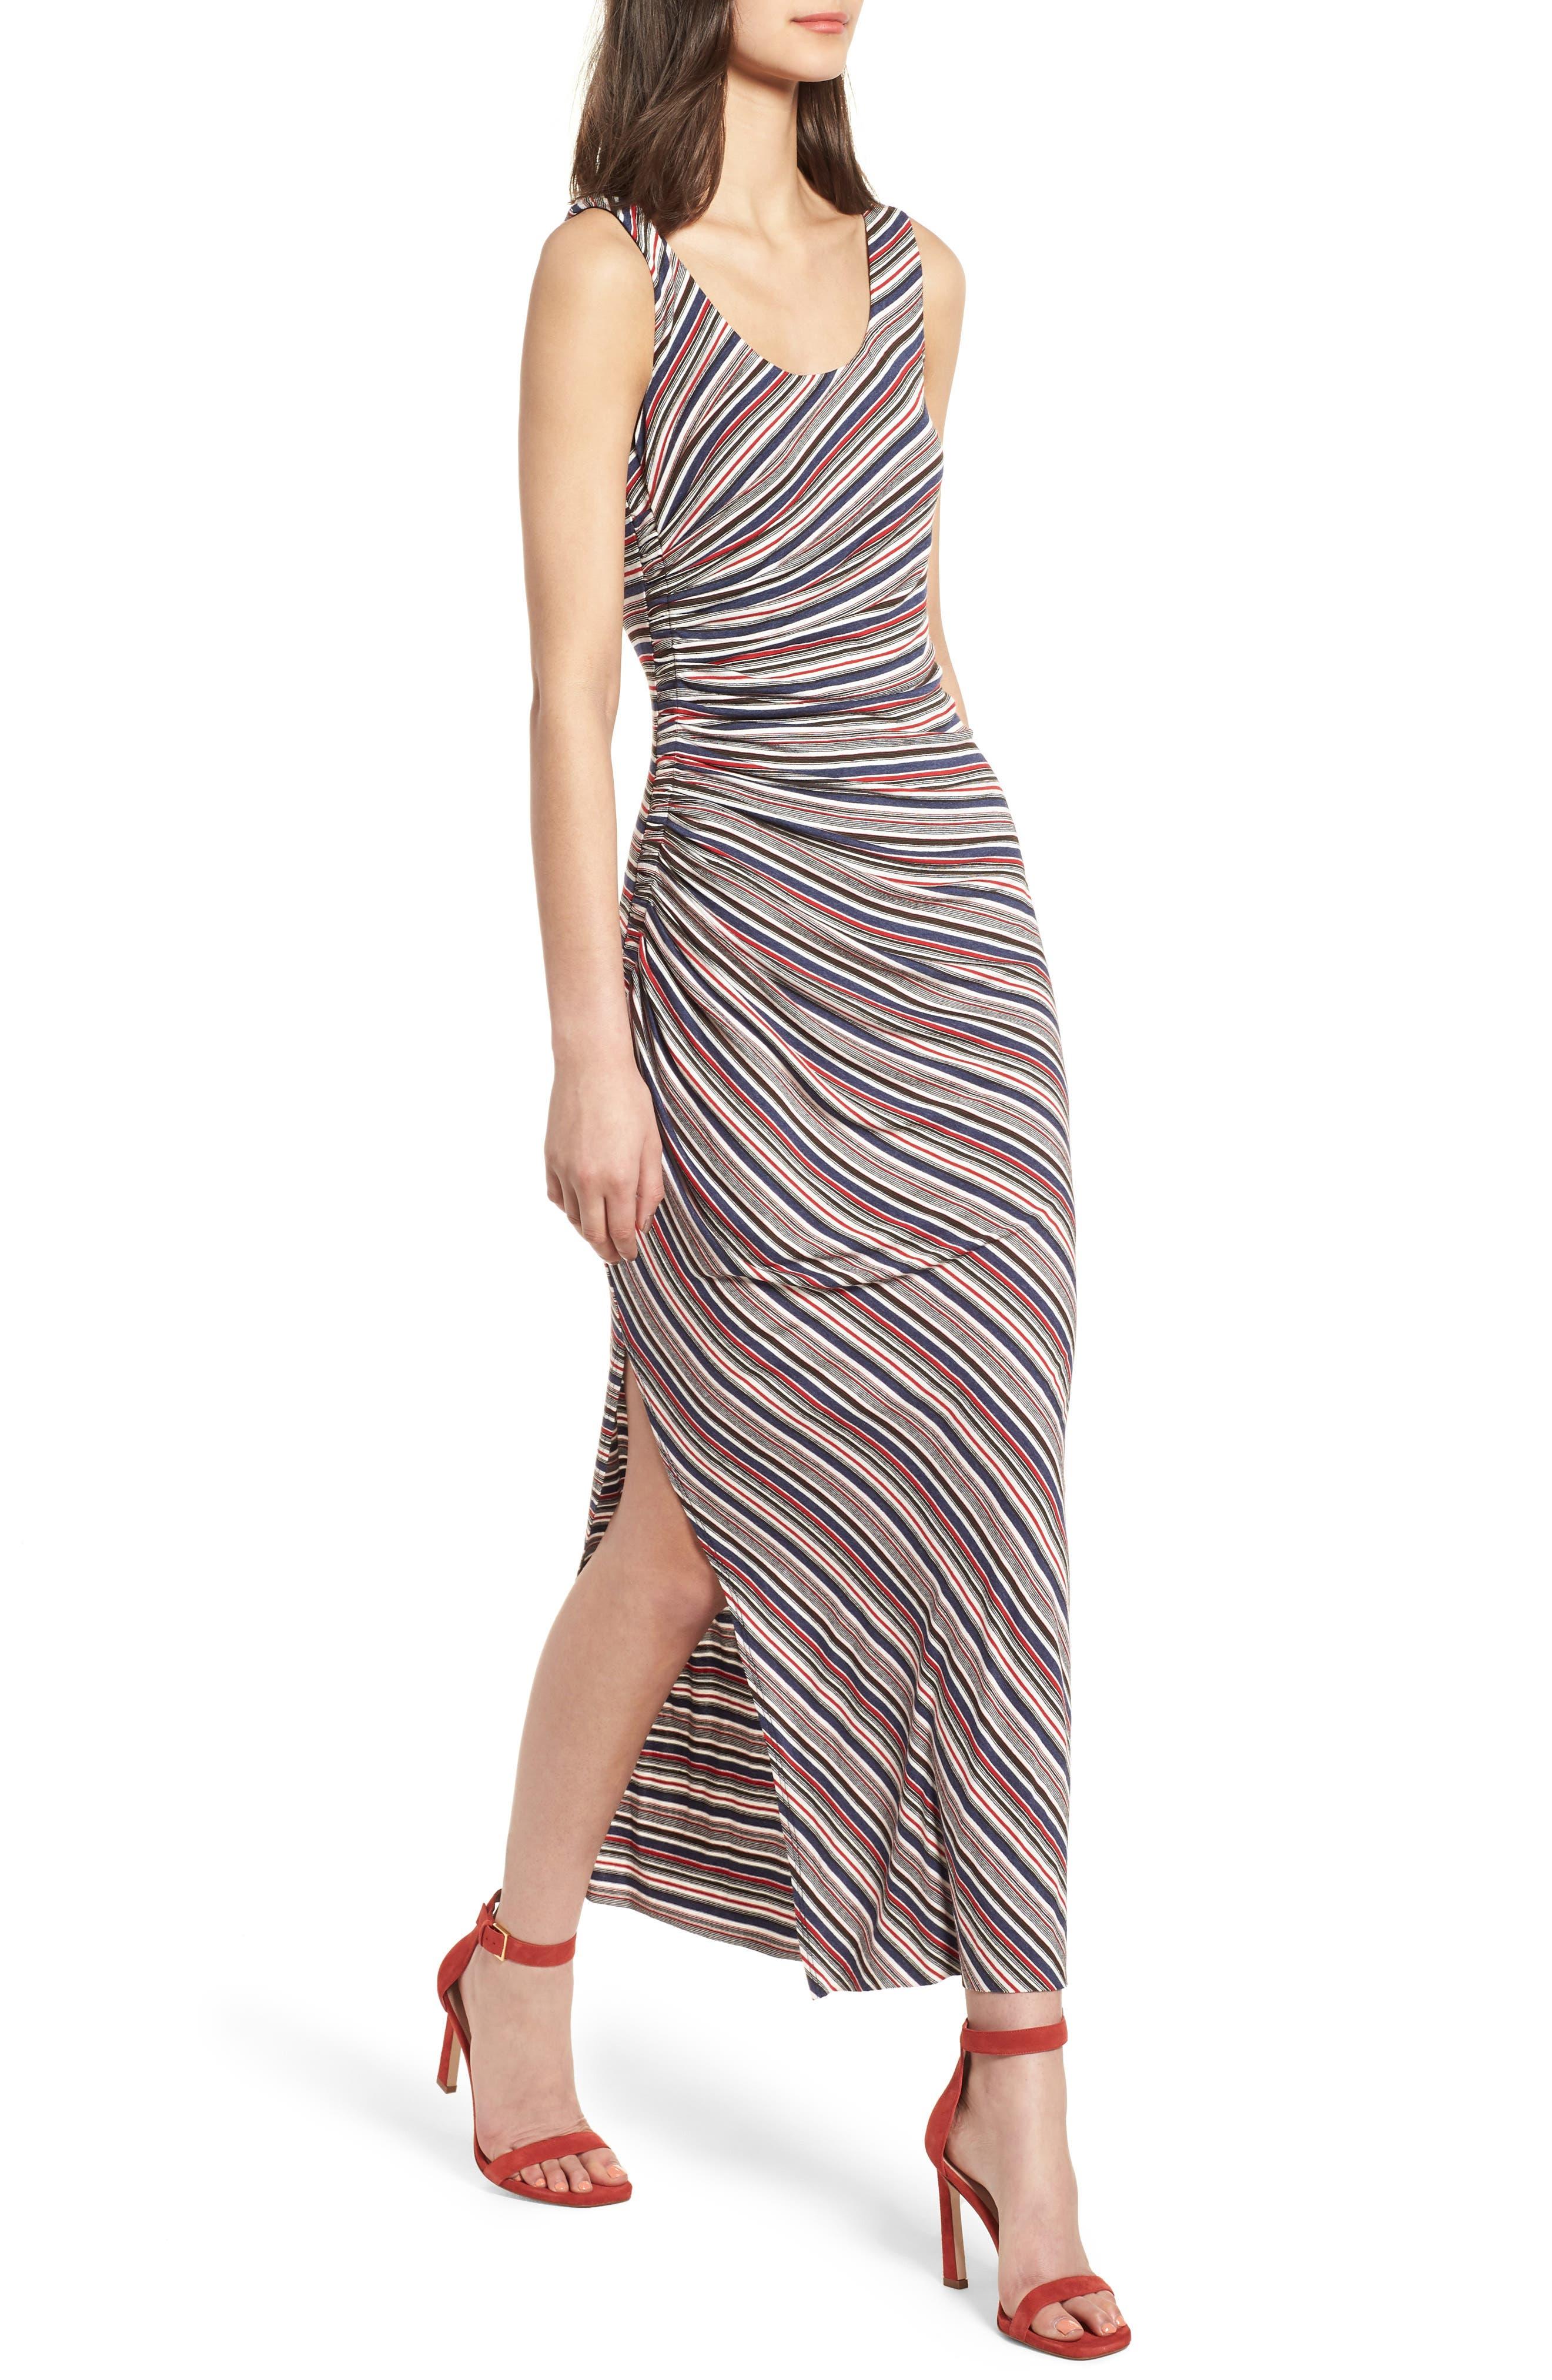 Duststorm Stripe Maxi Tank Dress,                             Main thumbnail 1, color,                             411